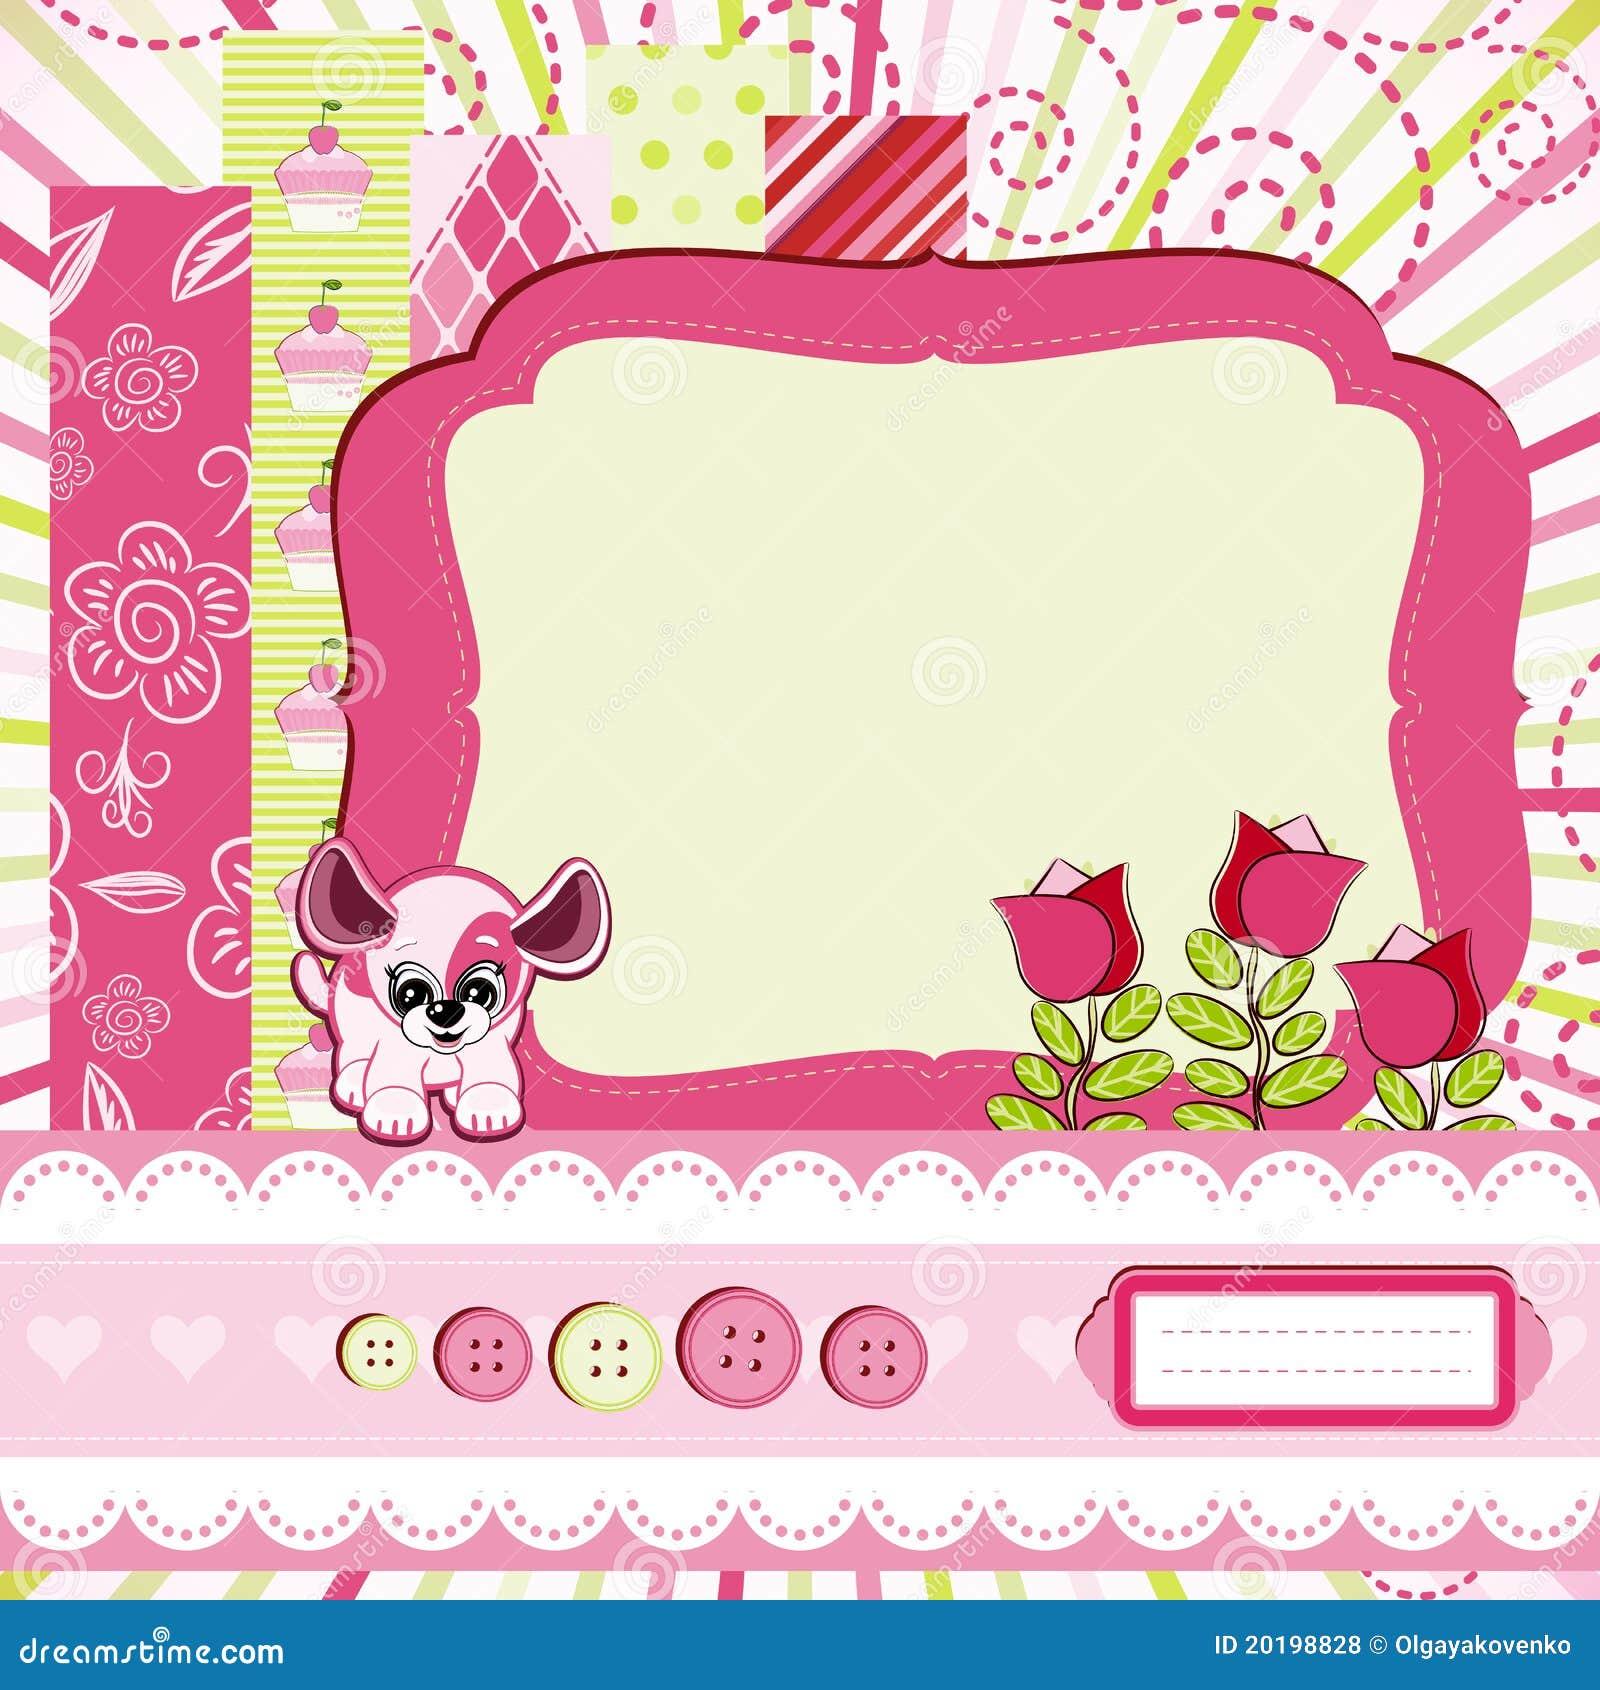 Puppy Birthday Invitations with beautiful invitation layout